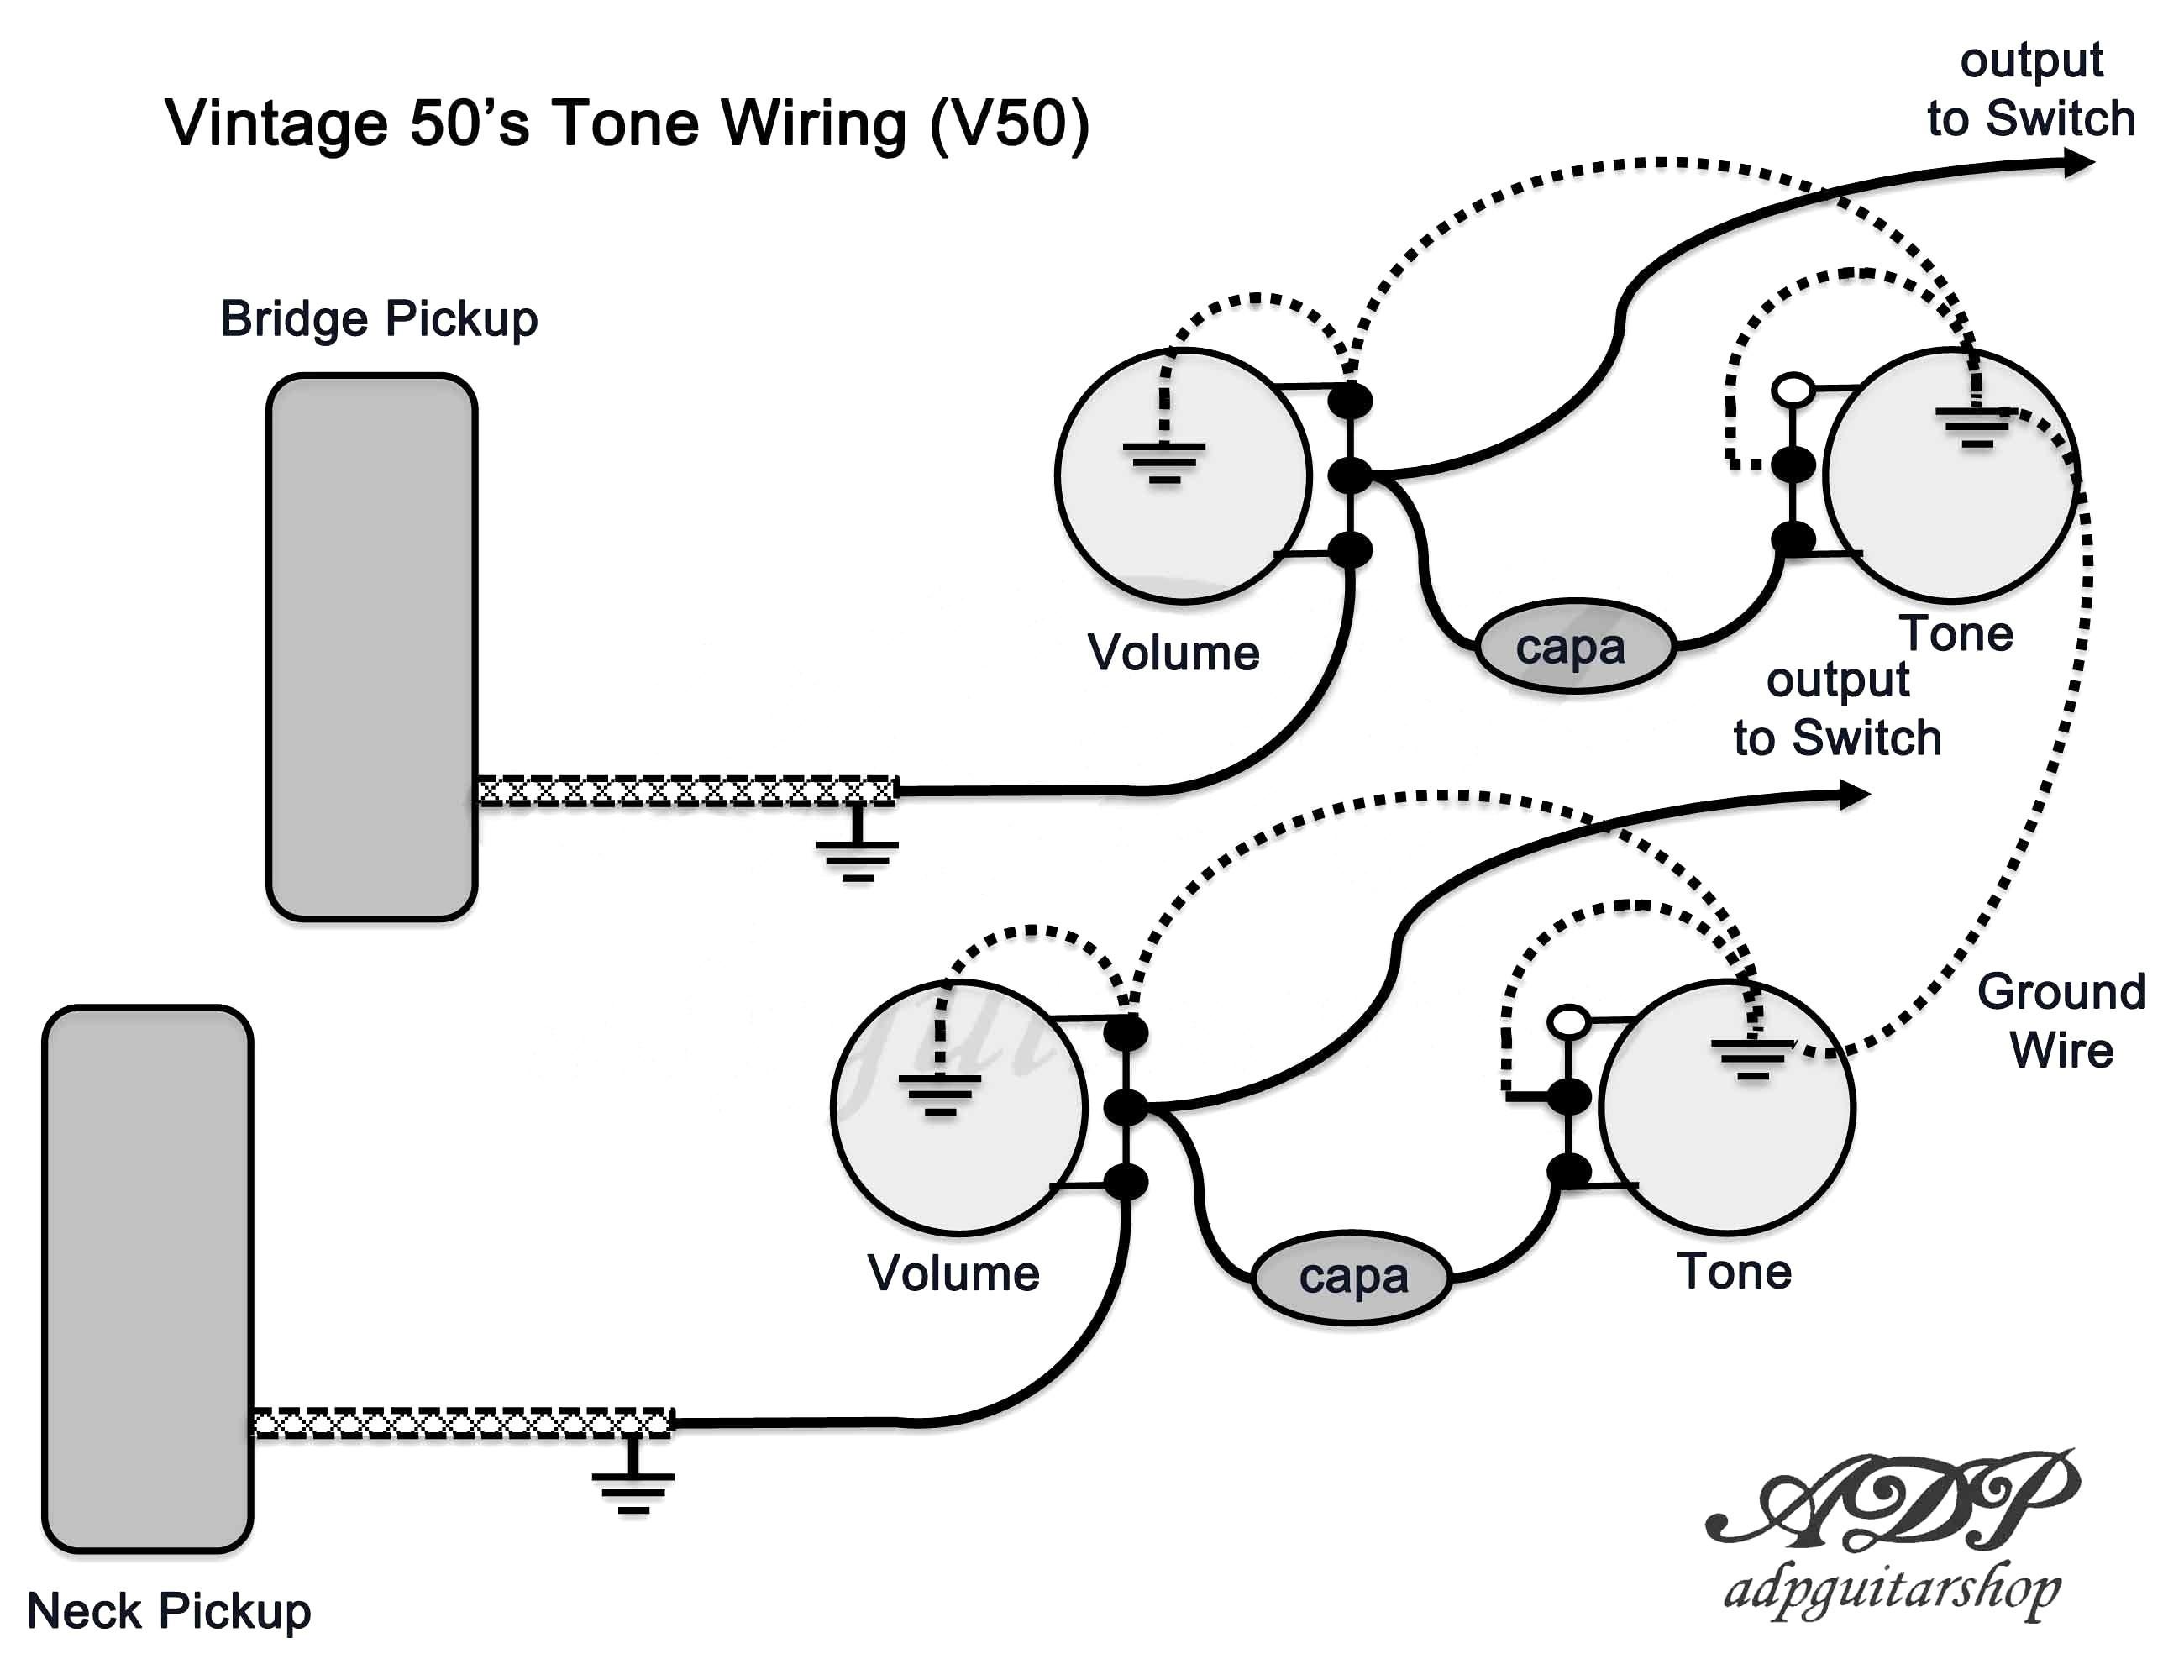 jackson js22 7 wire diagram ss 8693  wiring diagram jackson guitar wiring schematics jackson  ss 8693  wiring diagram jackson guitar